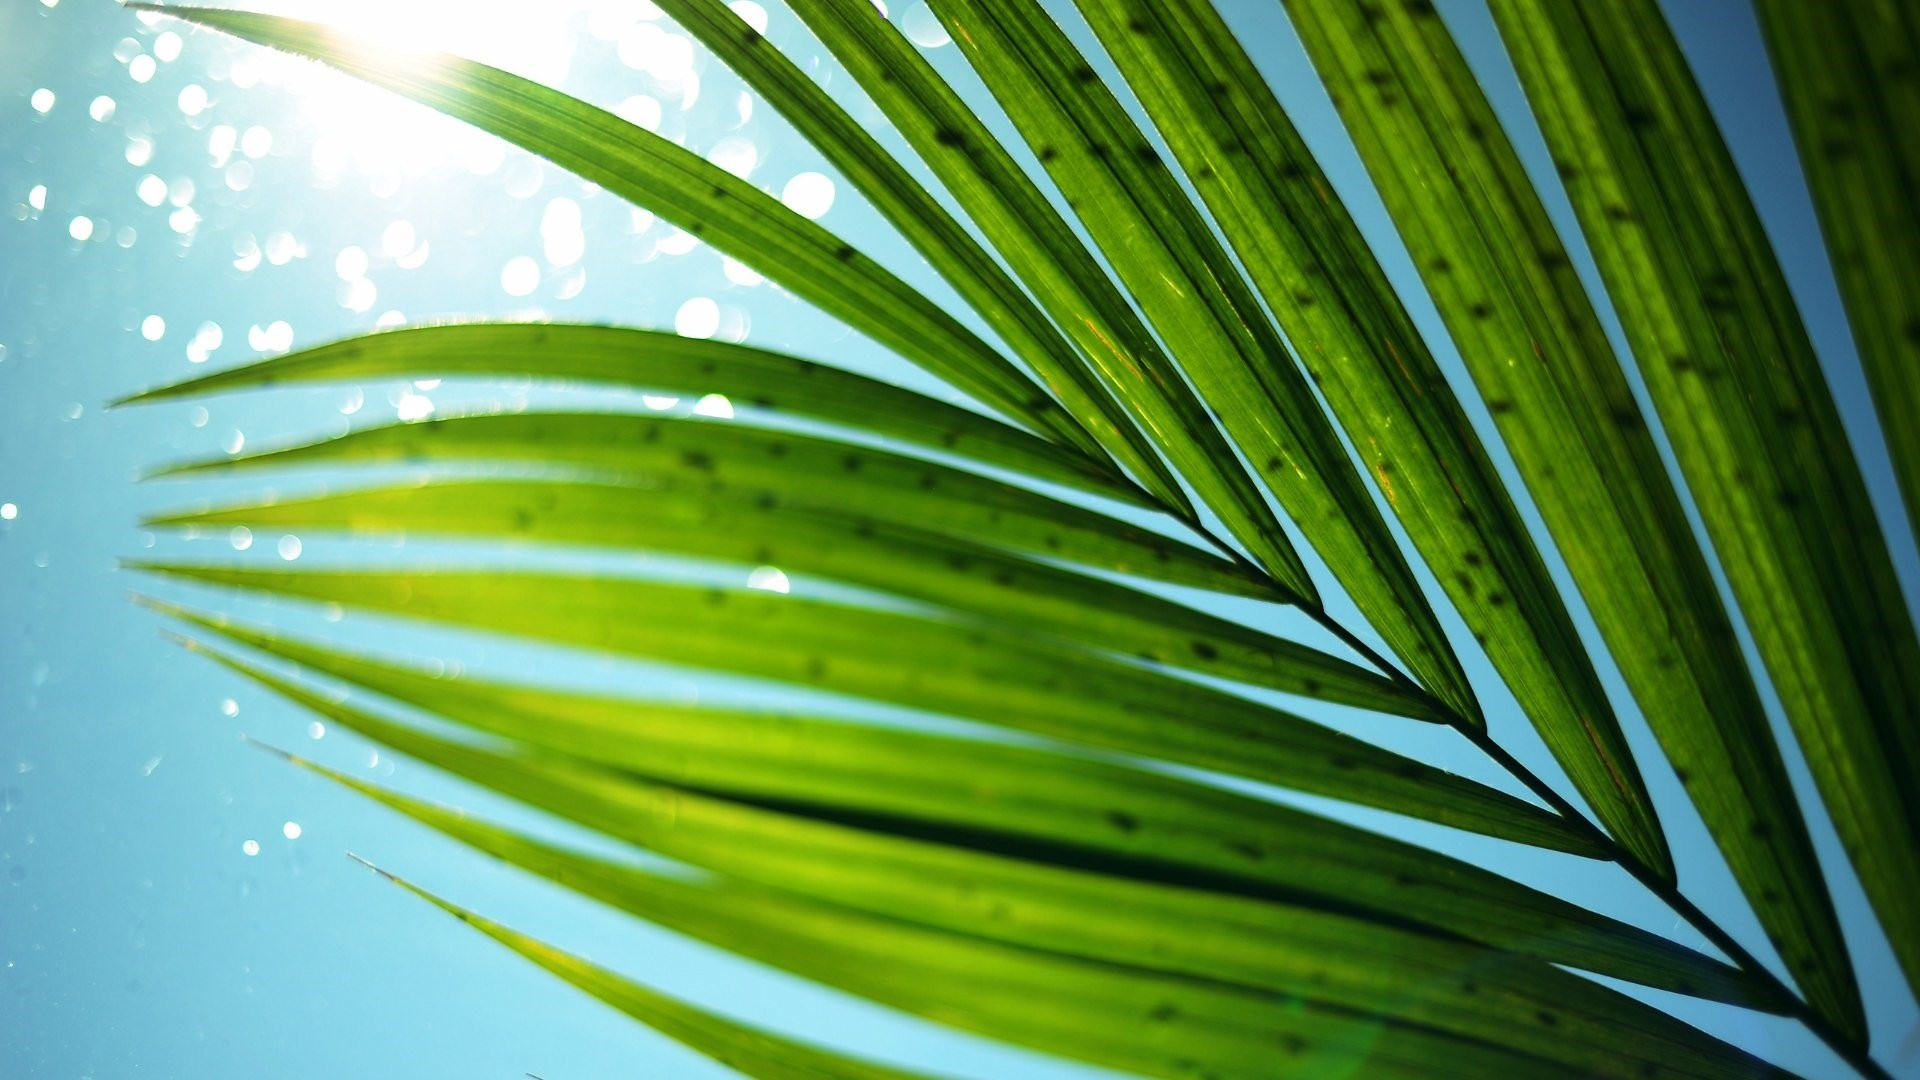 Tropical Leaf Wallpaper theme